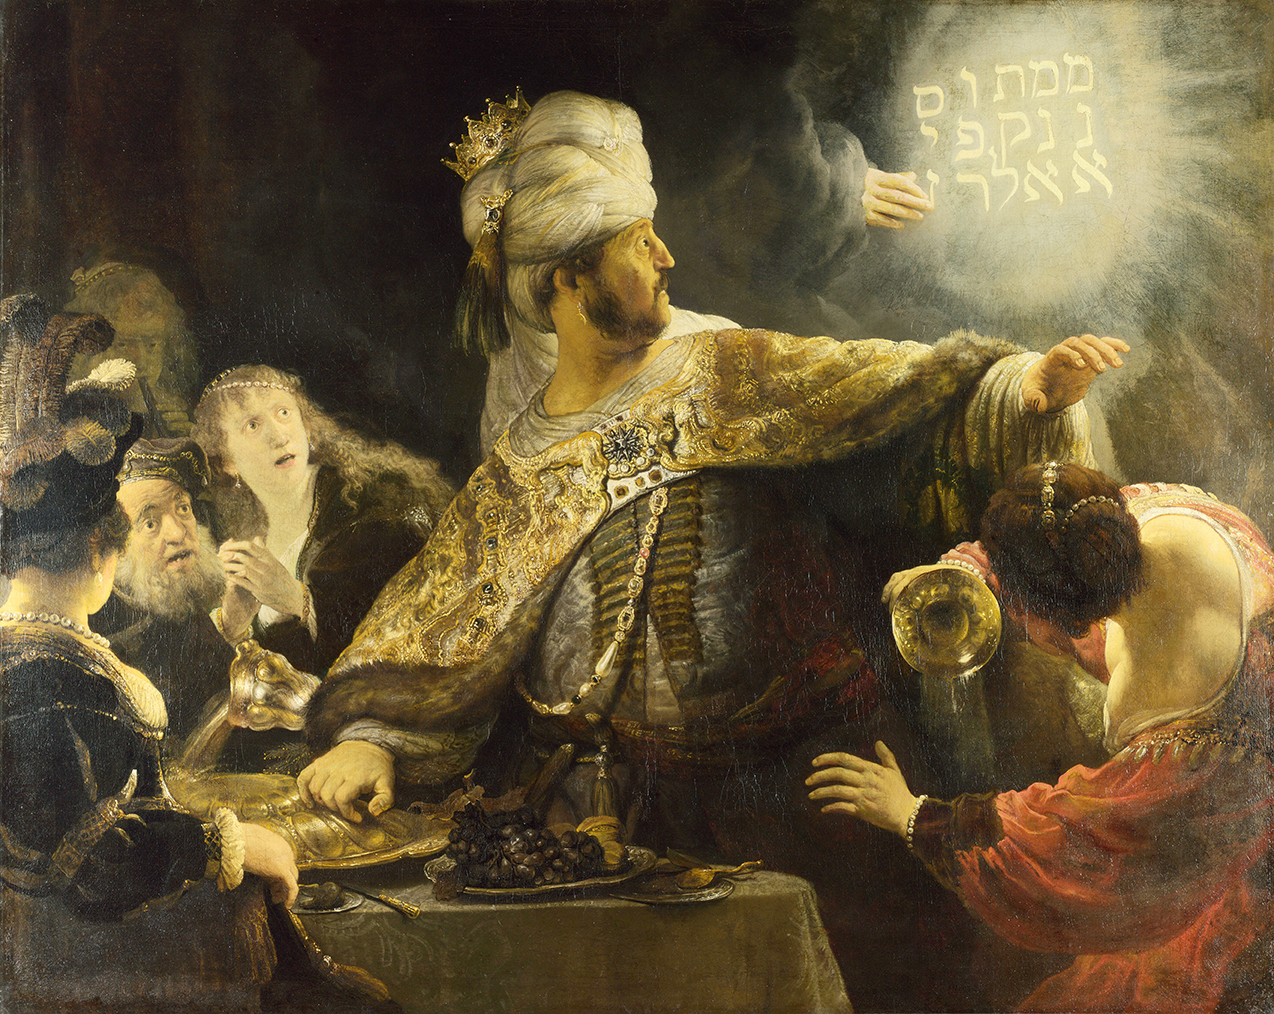 rembrandt-van-rijn-belshazzars-gjestebud-1635.jpg